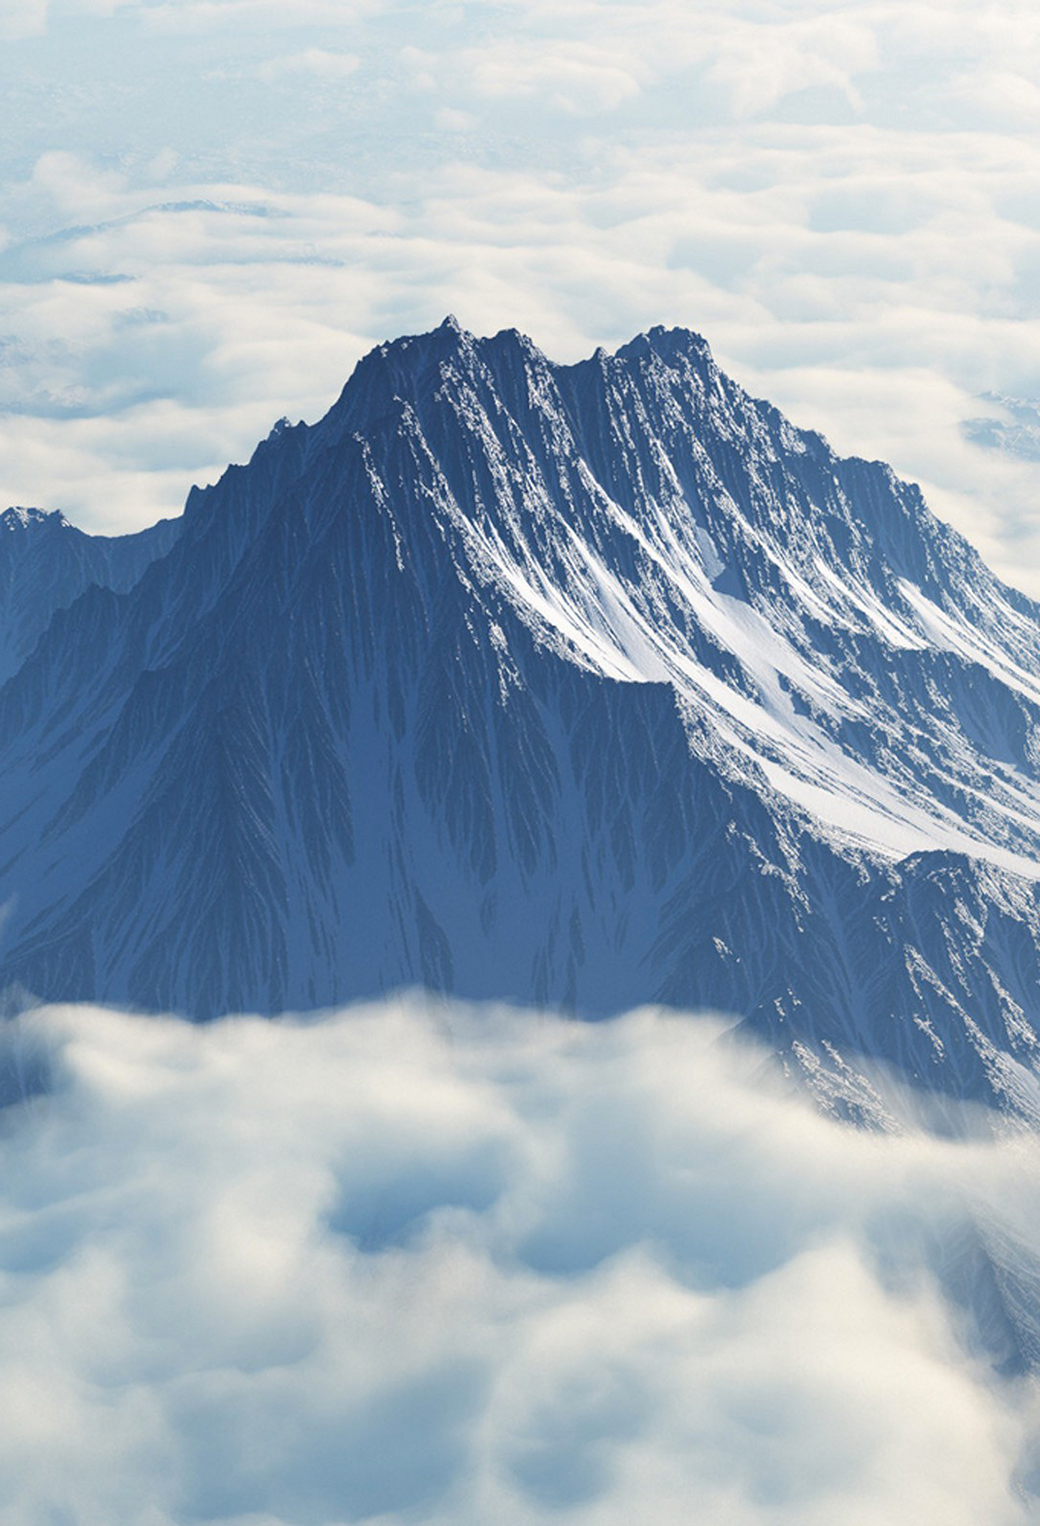 Mountain 3Wallpapers iPhone Parallax Mountain